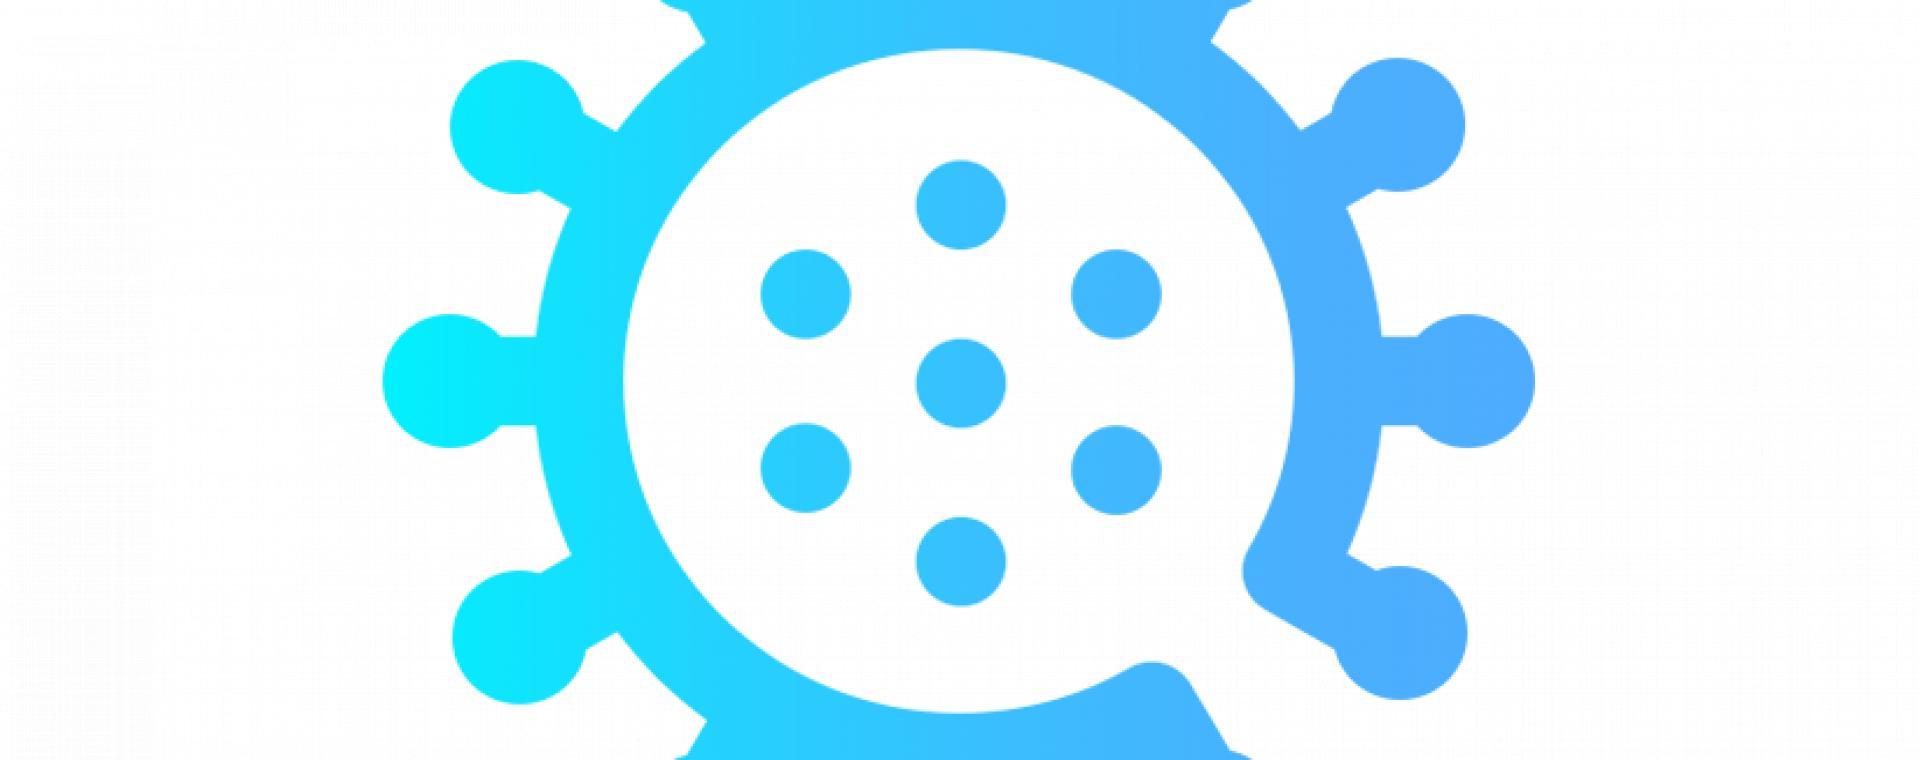 Blue icon of coronavirus cell